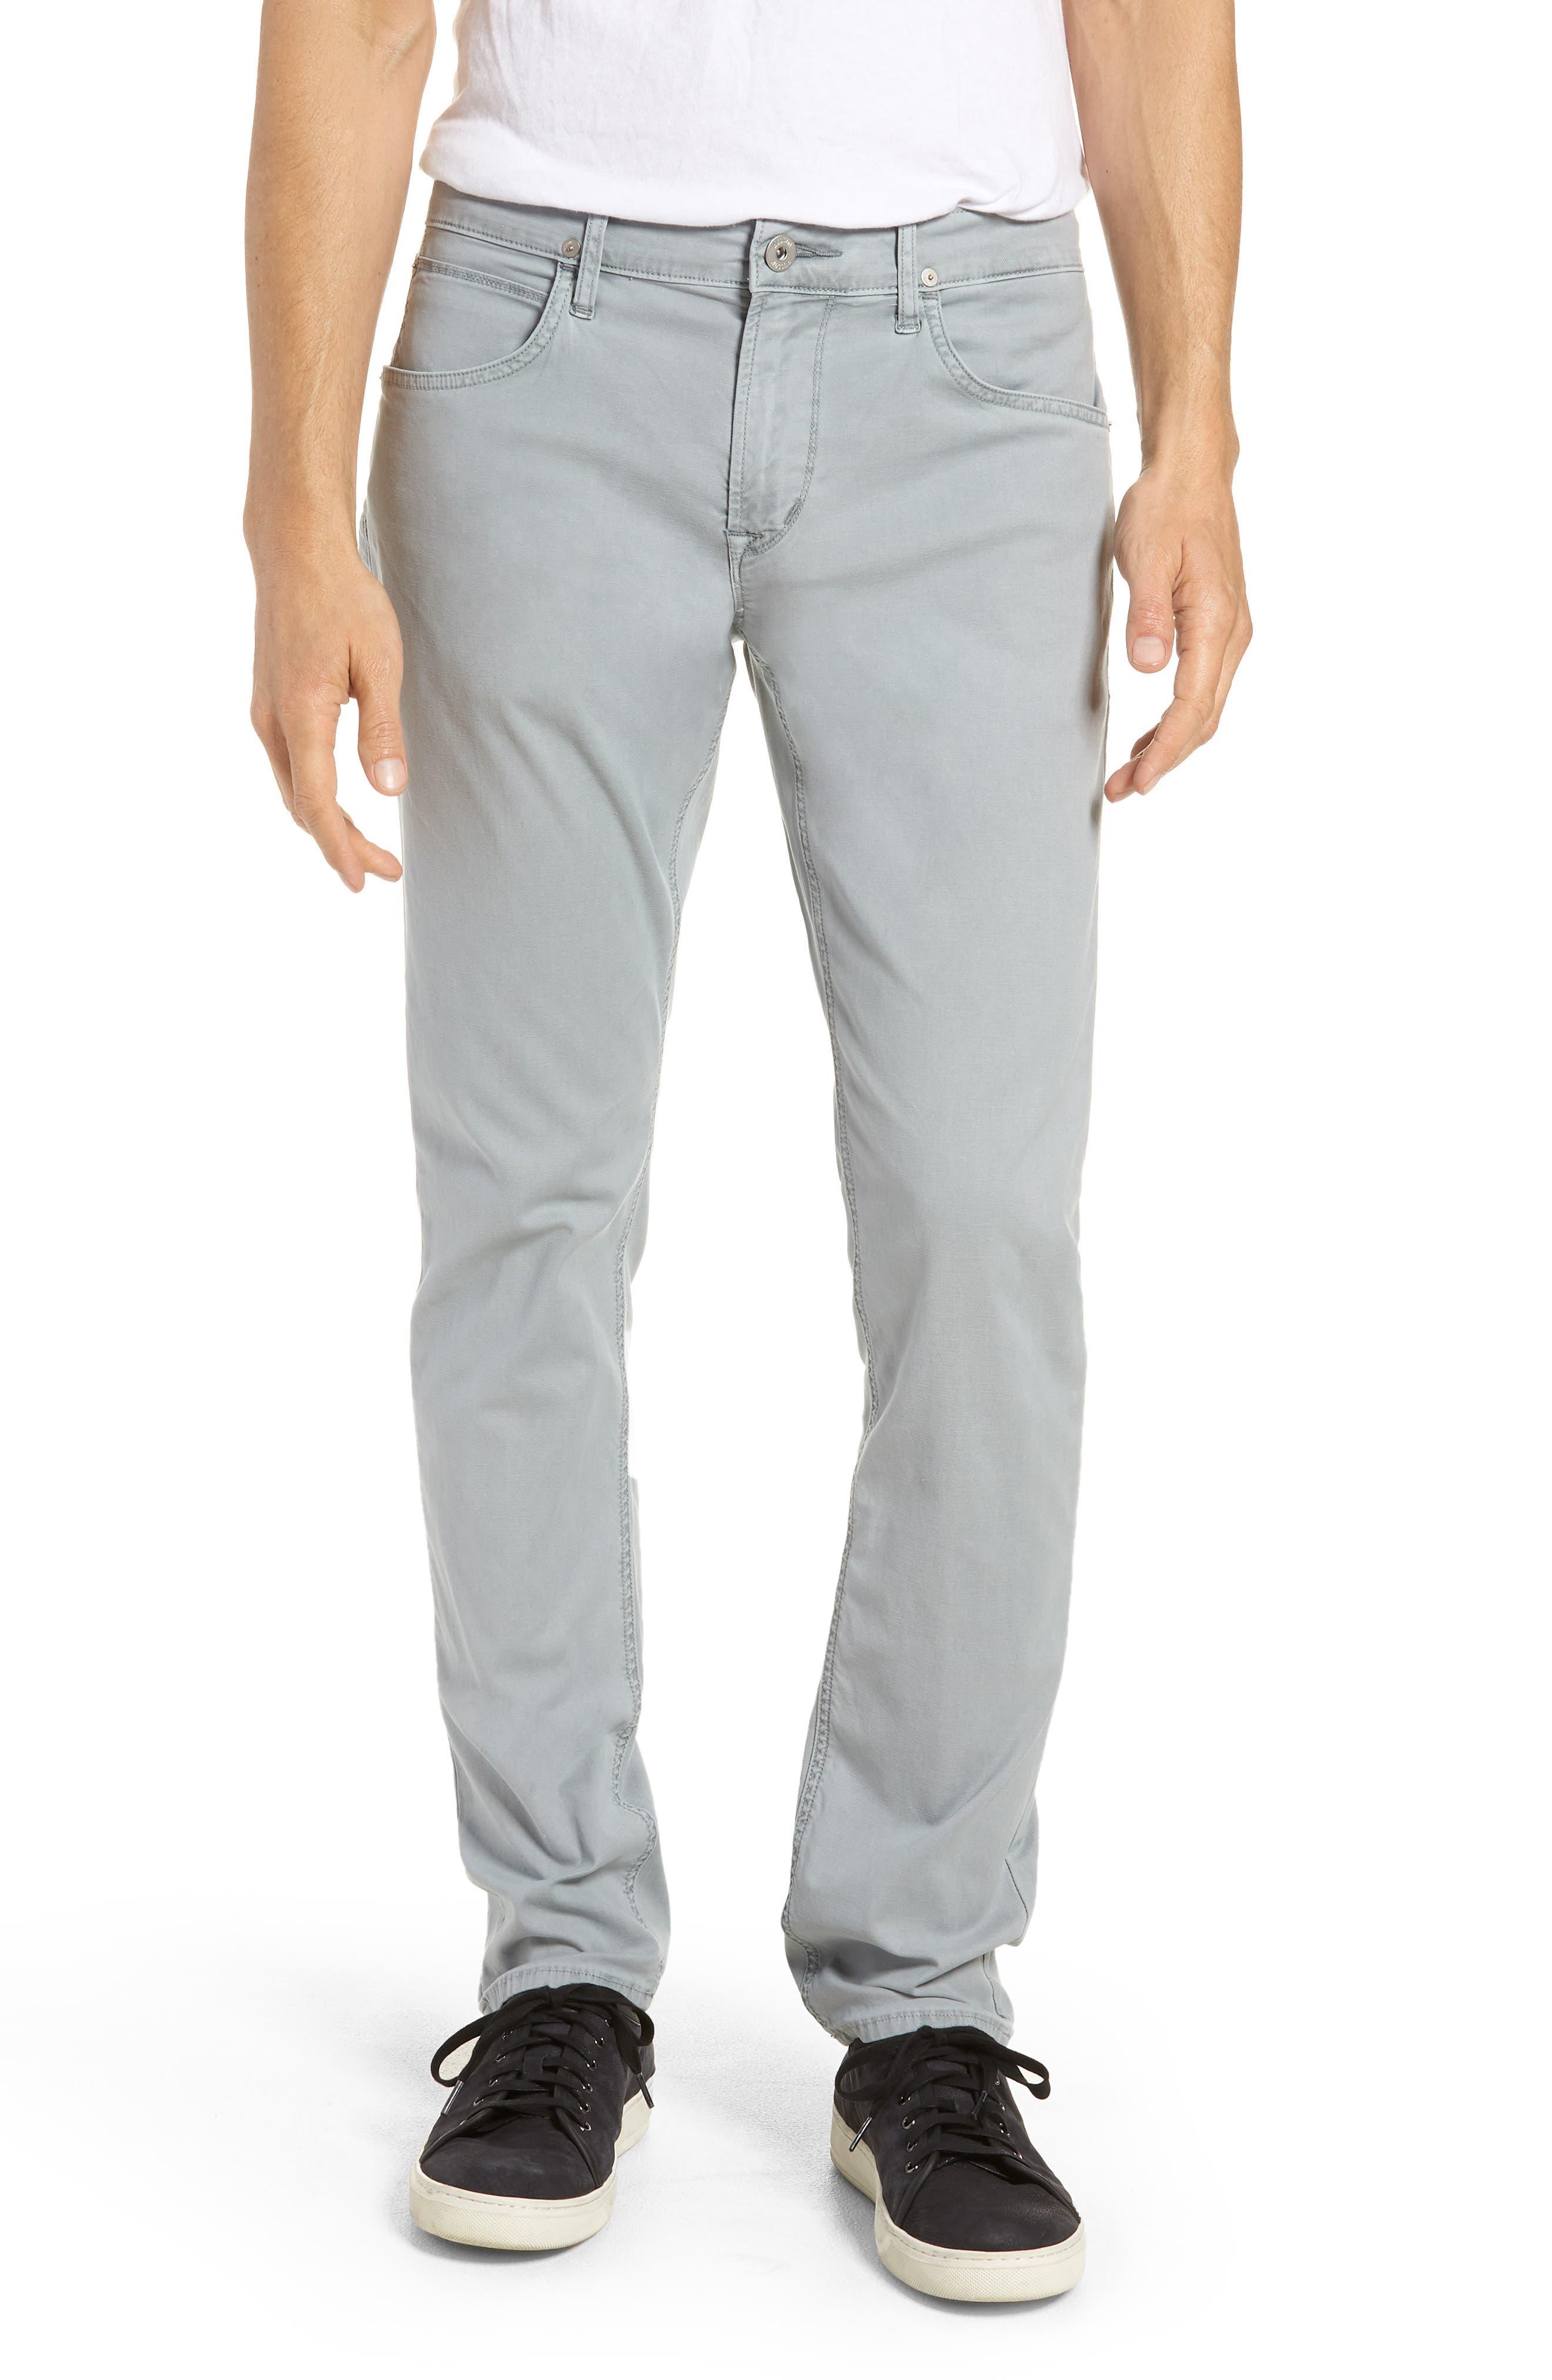 HUDSON JEANS,                             Blake Slim Fit Jeans,                             Main thumbnail 1, color,                             400